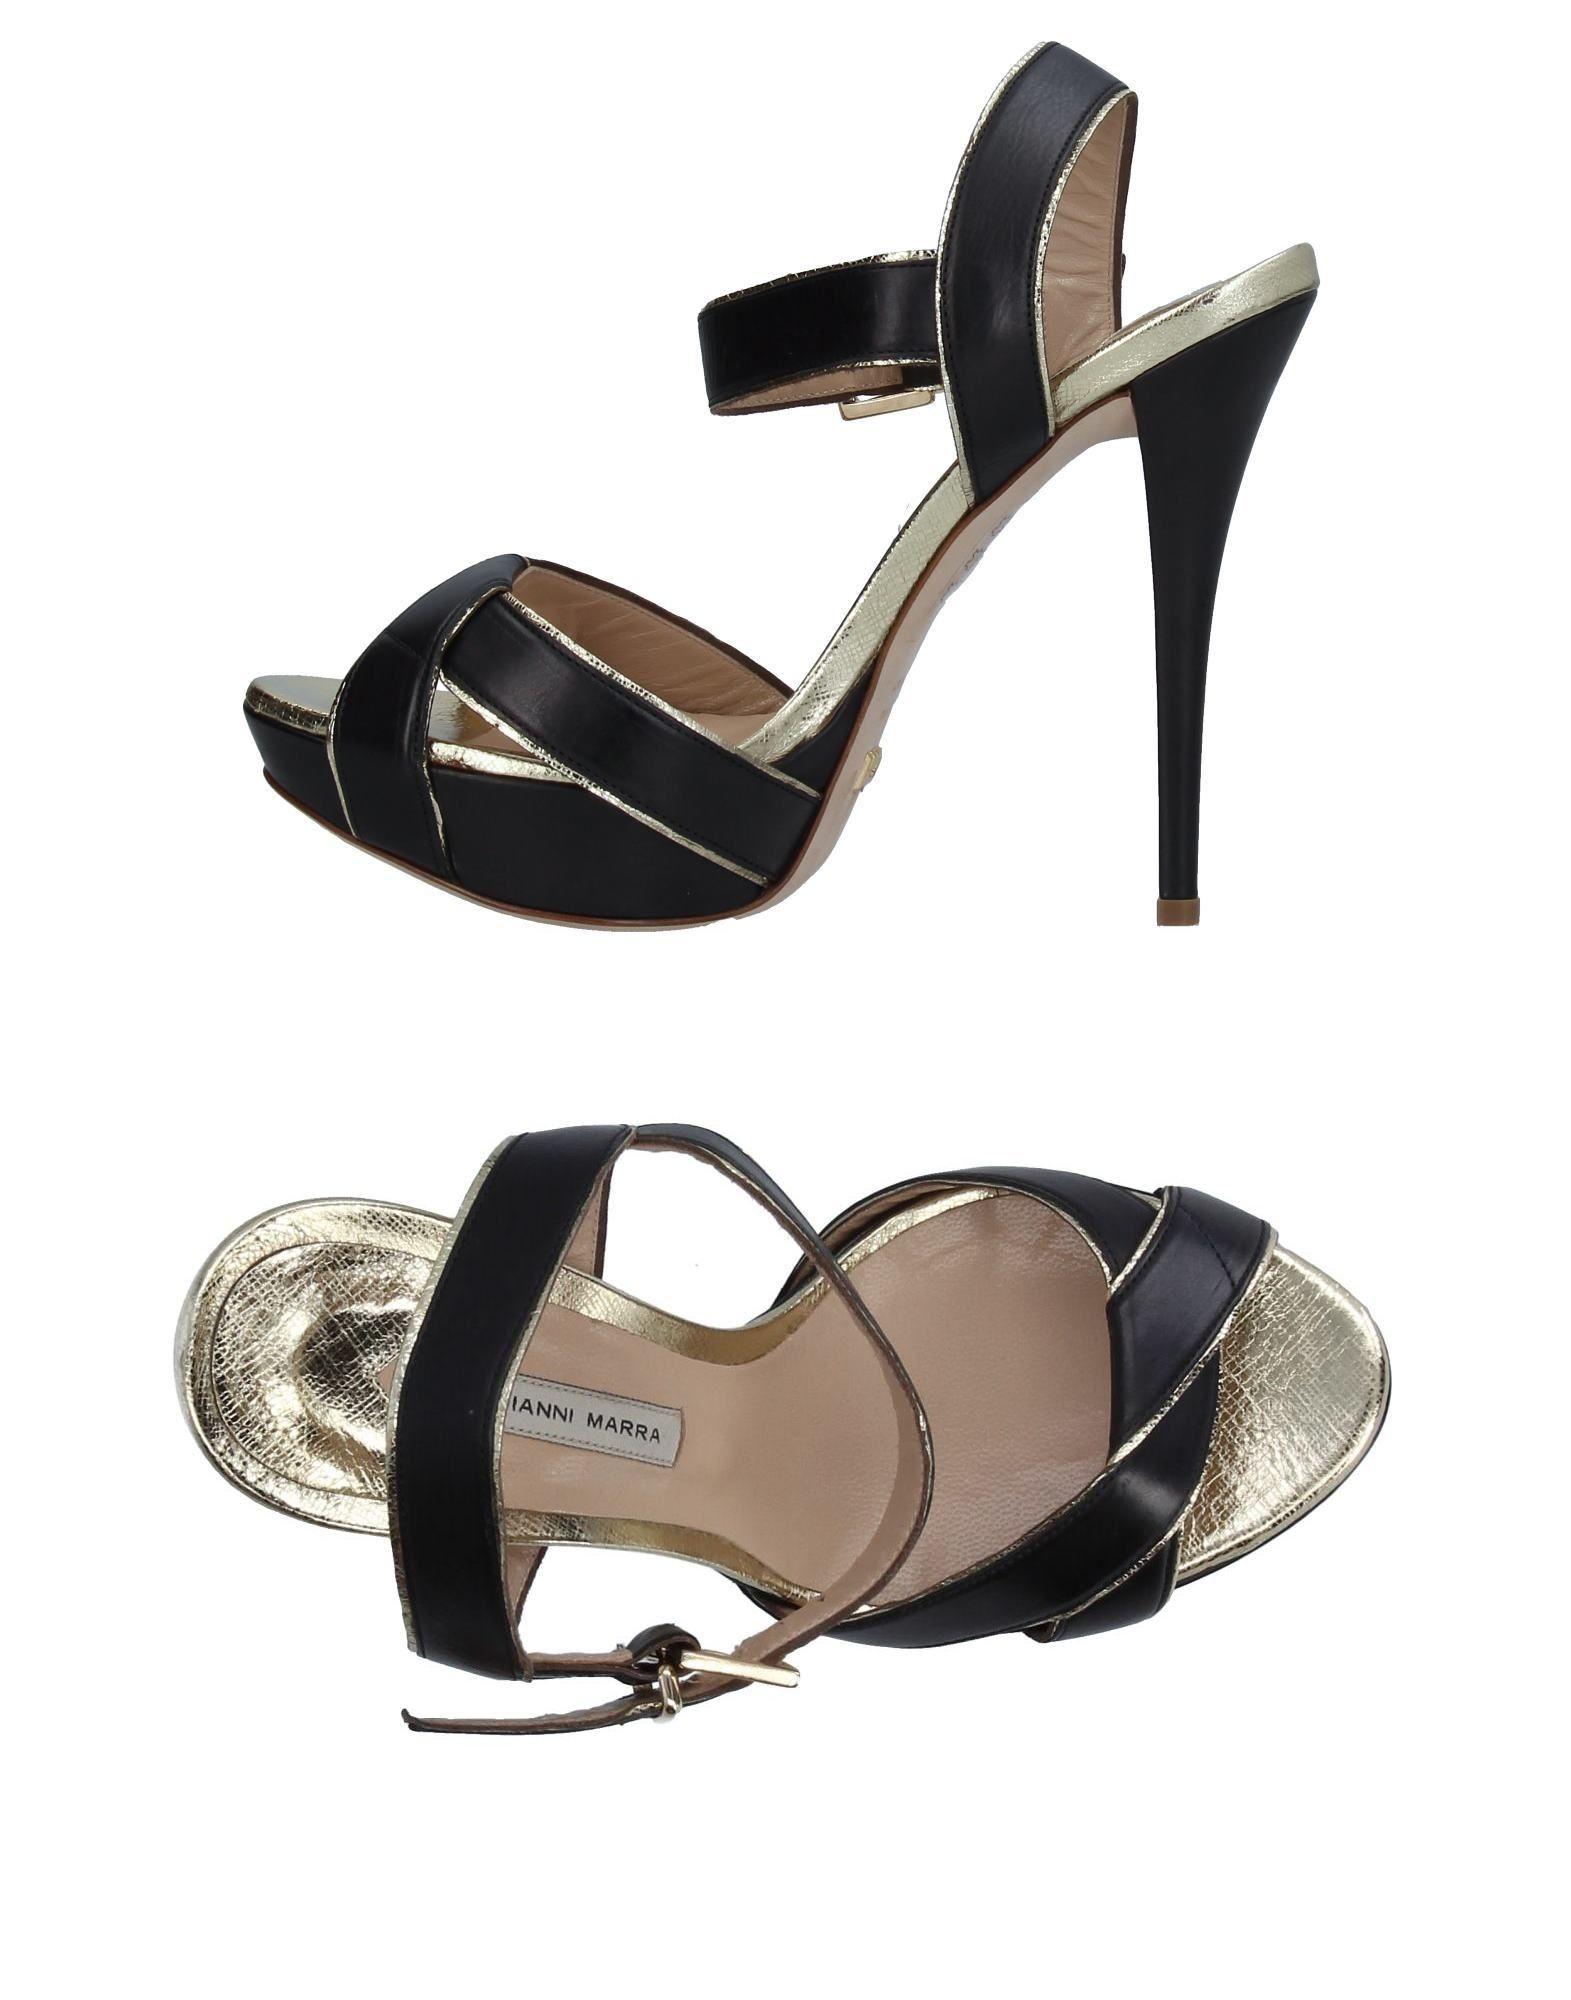 Gianni Marra Sandalen Qualität Damen  11358850TP Gute Qualität Sandalen beliebte Schuhe 0cab87